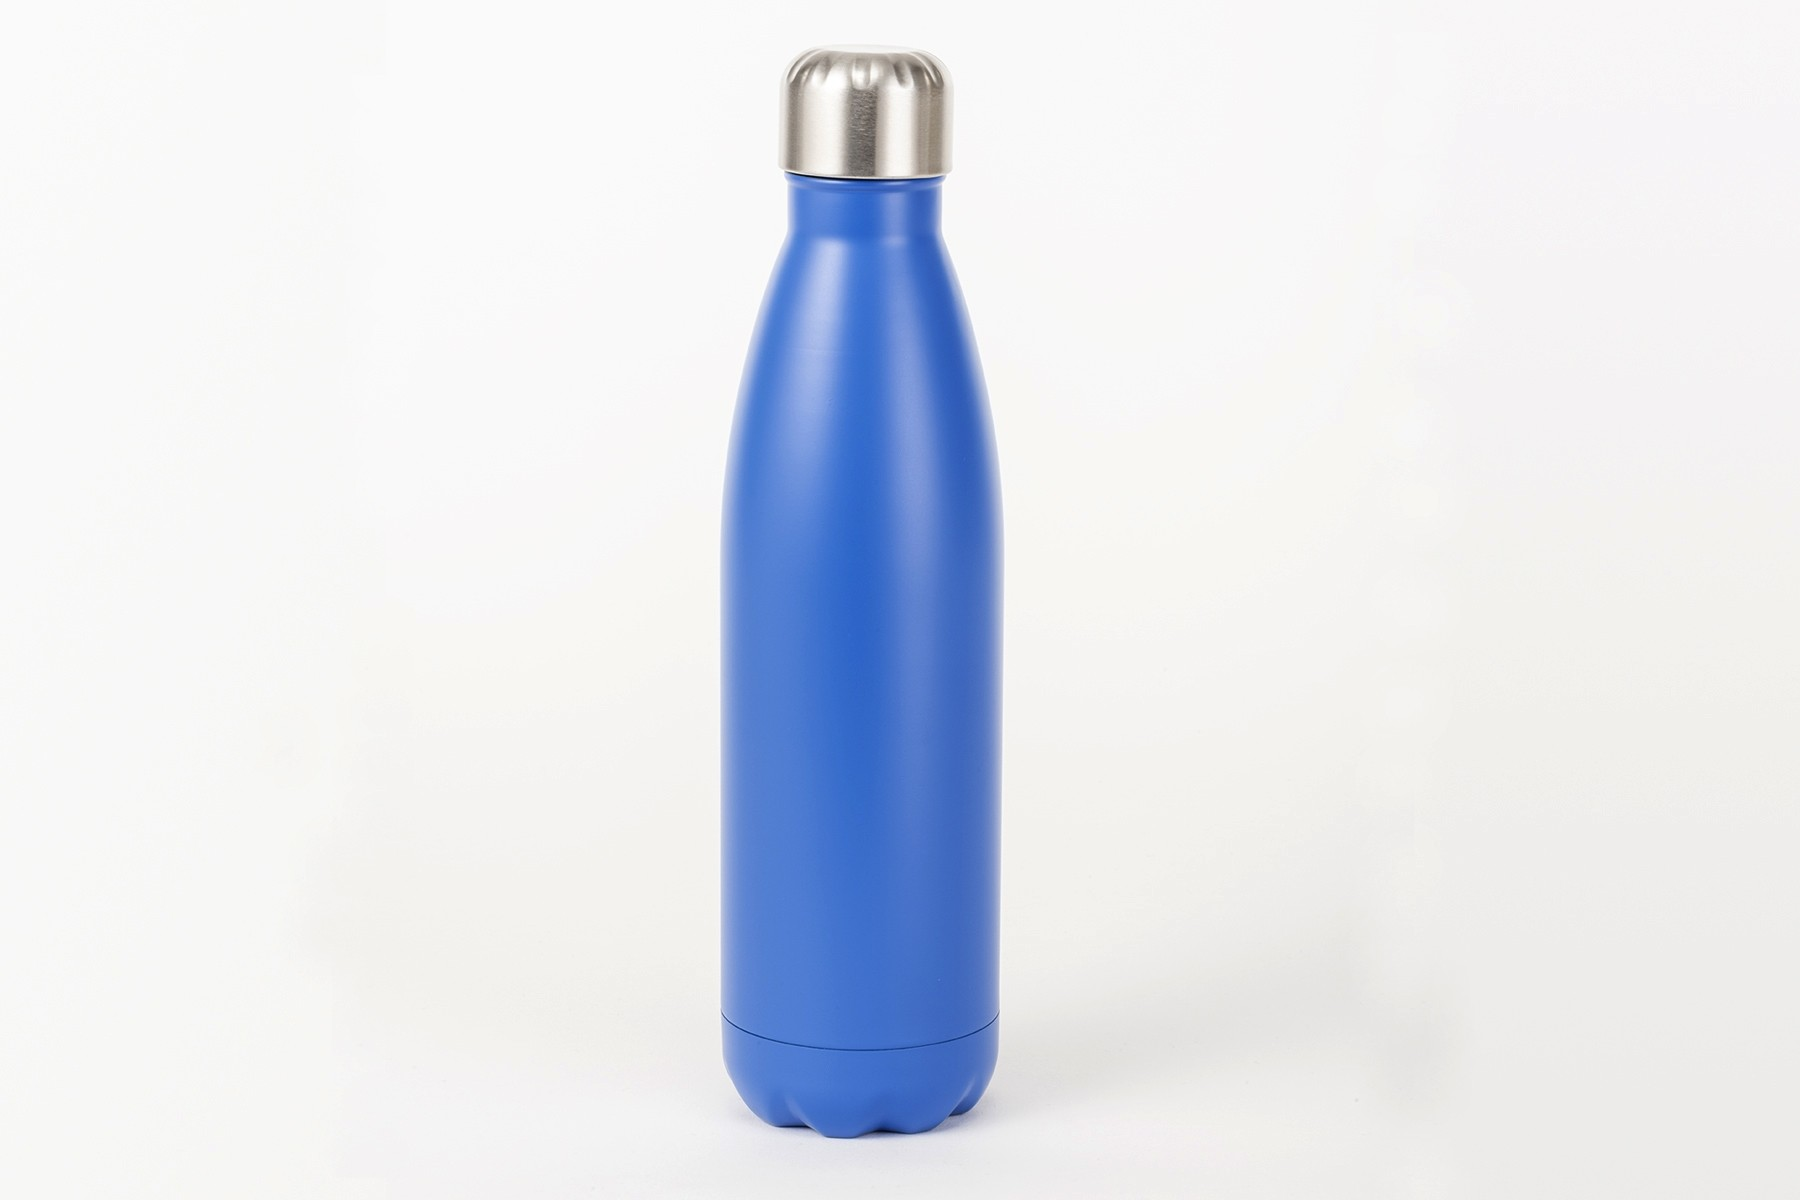 Butelka niebieska, 500 ml